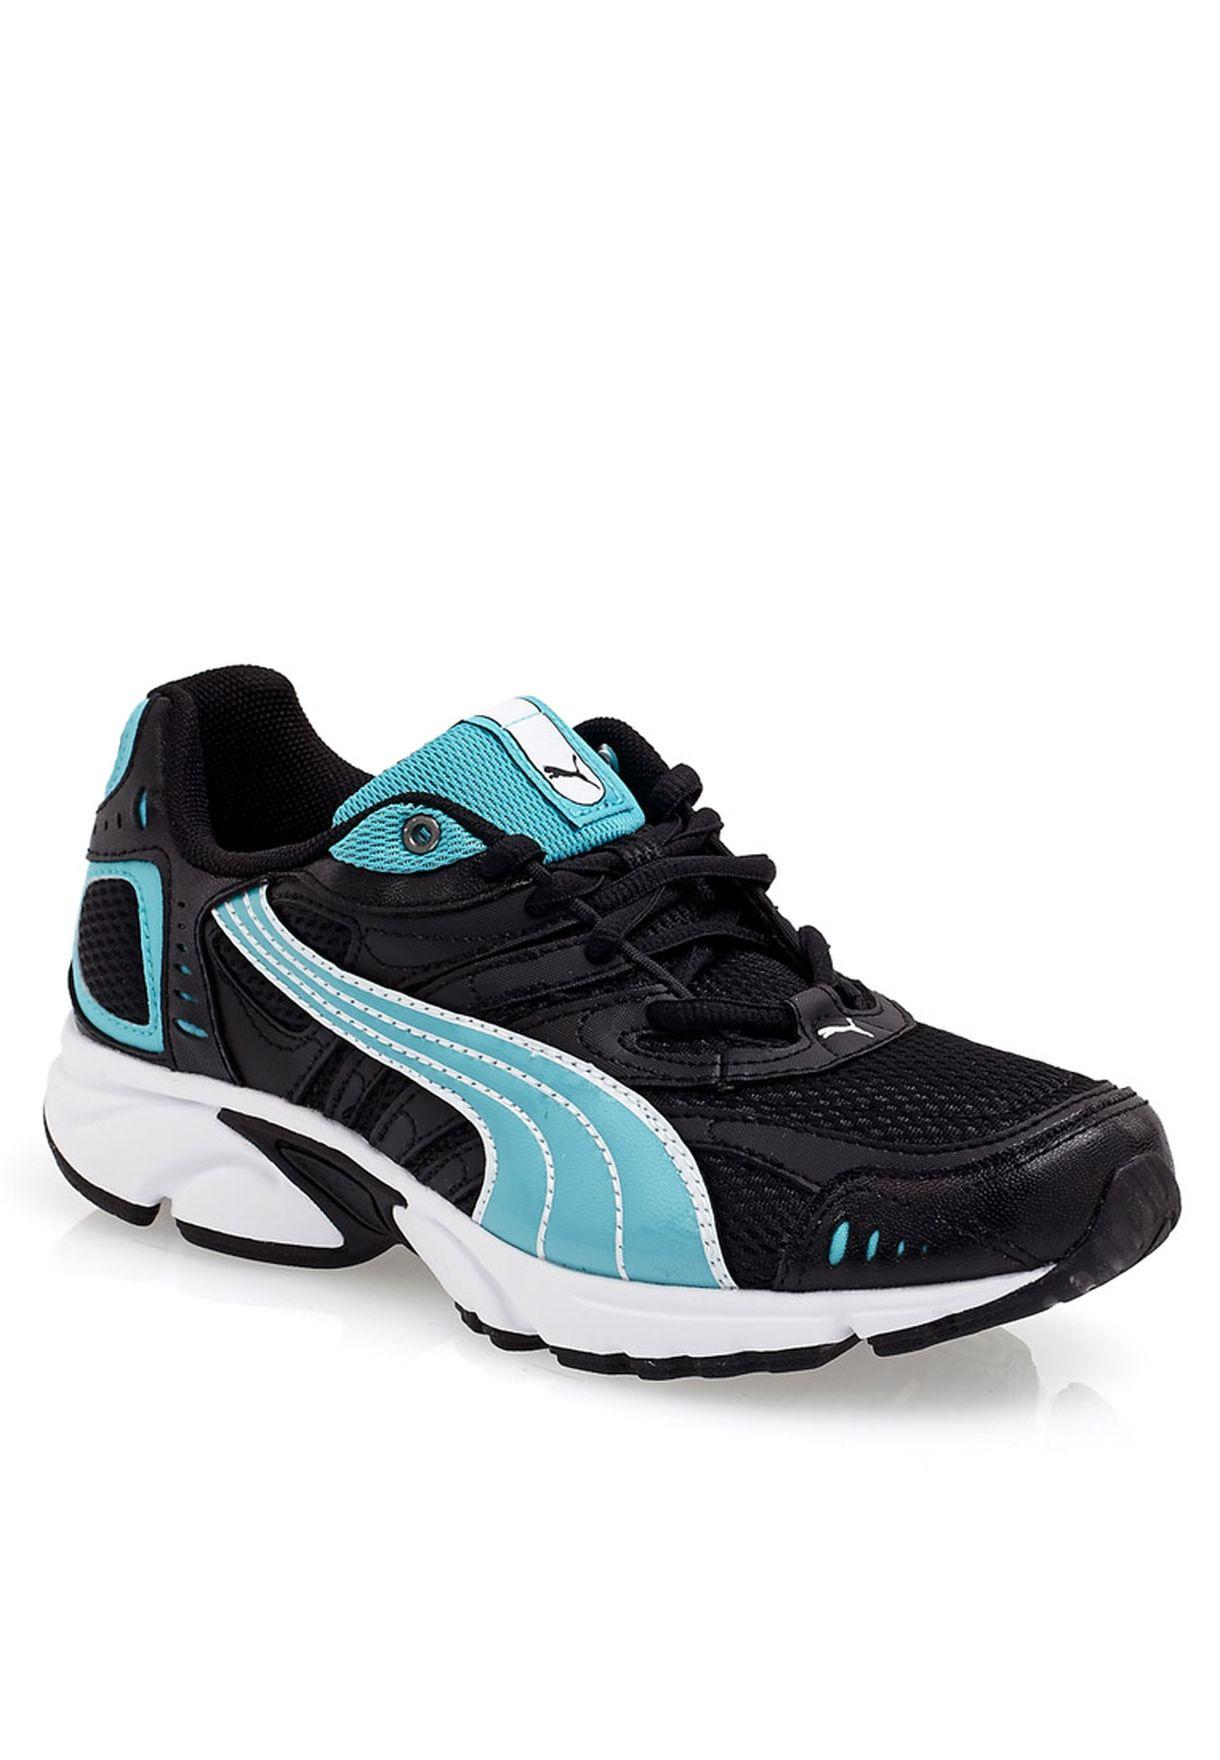 2956bc8ede92 many fashionable cae3d 6b6ec puma black and blue sports shoes ...